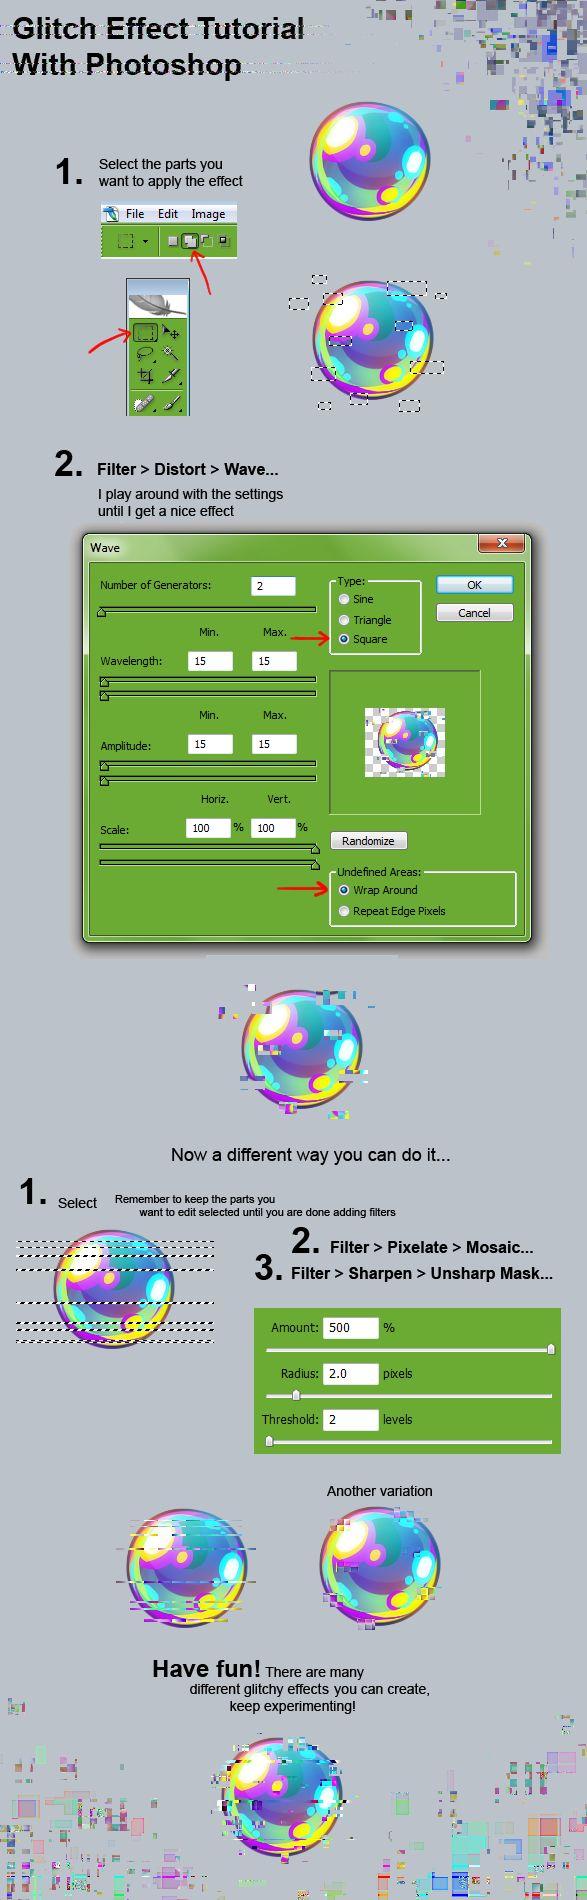 Glitch Effect Tutorial by Kawiku.deviantart.com on @deviantART